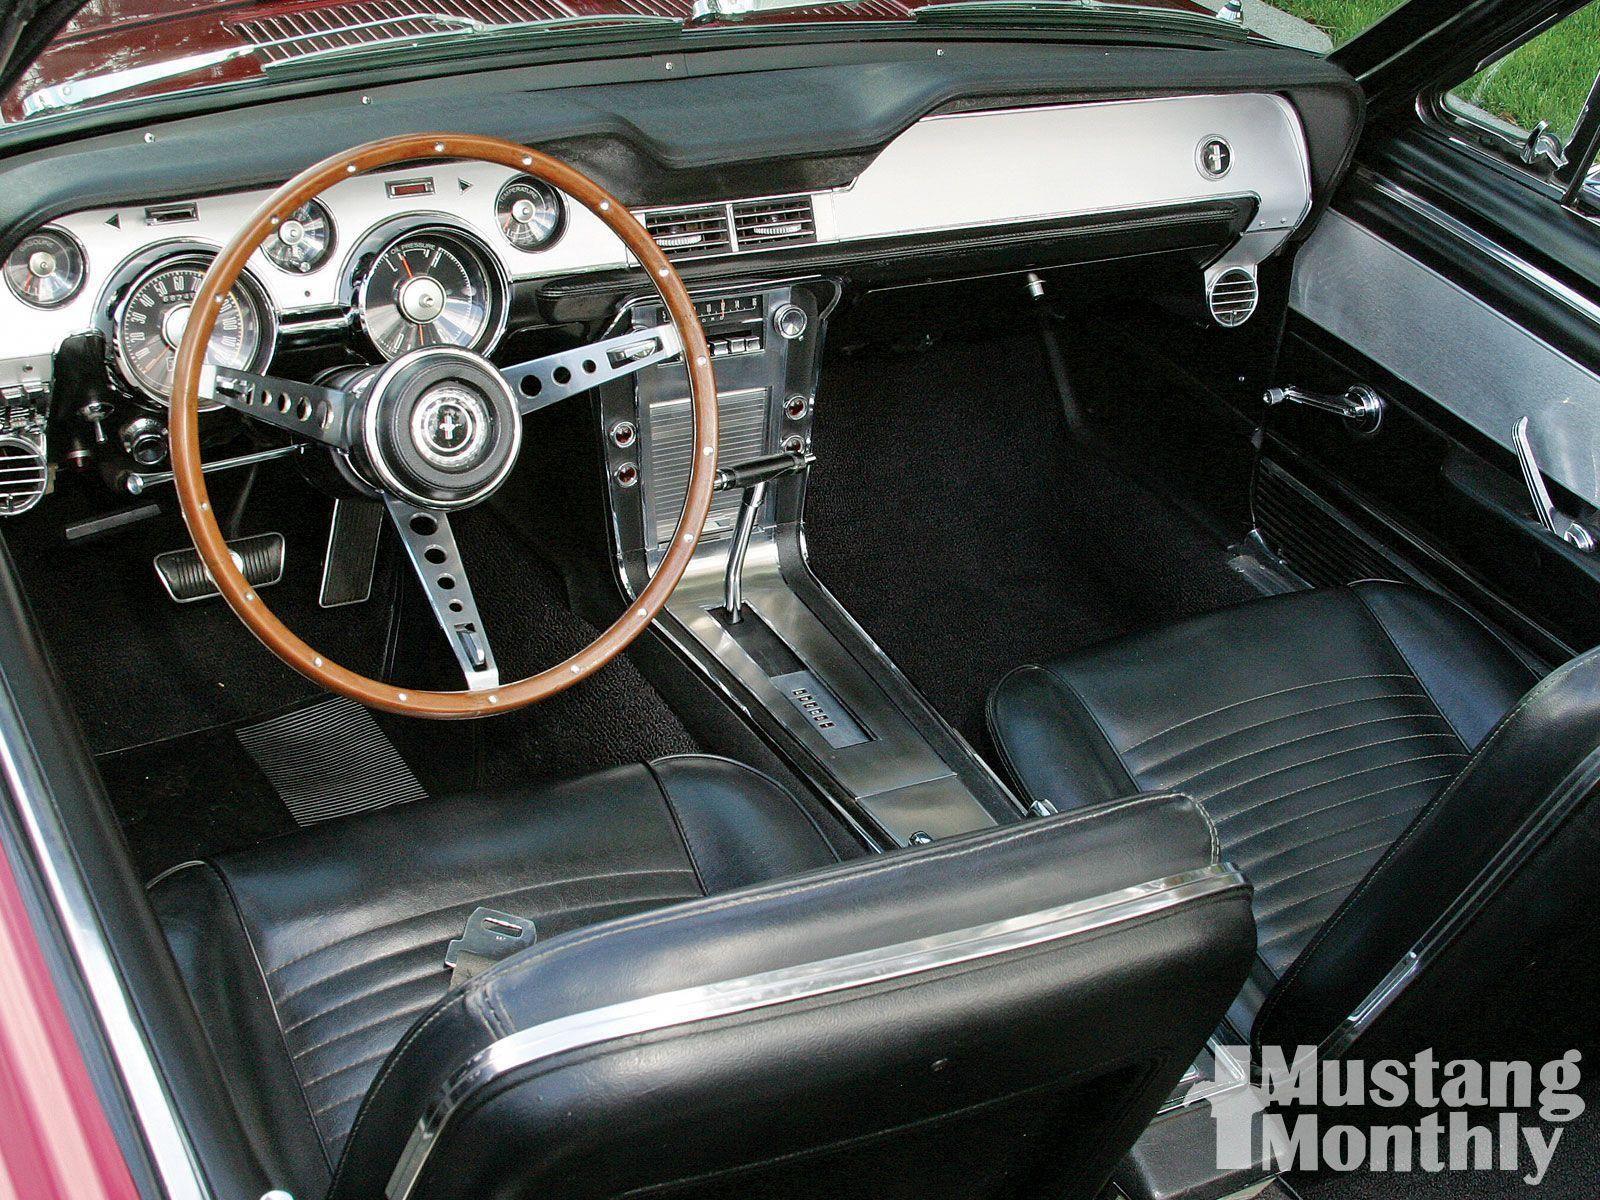 1967 Ford Mustang Convertible Interior Mustangclassiccars Ford Mustang Convertible Mustang Convertible 1967 Mustang Convertible